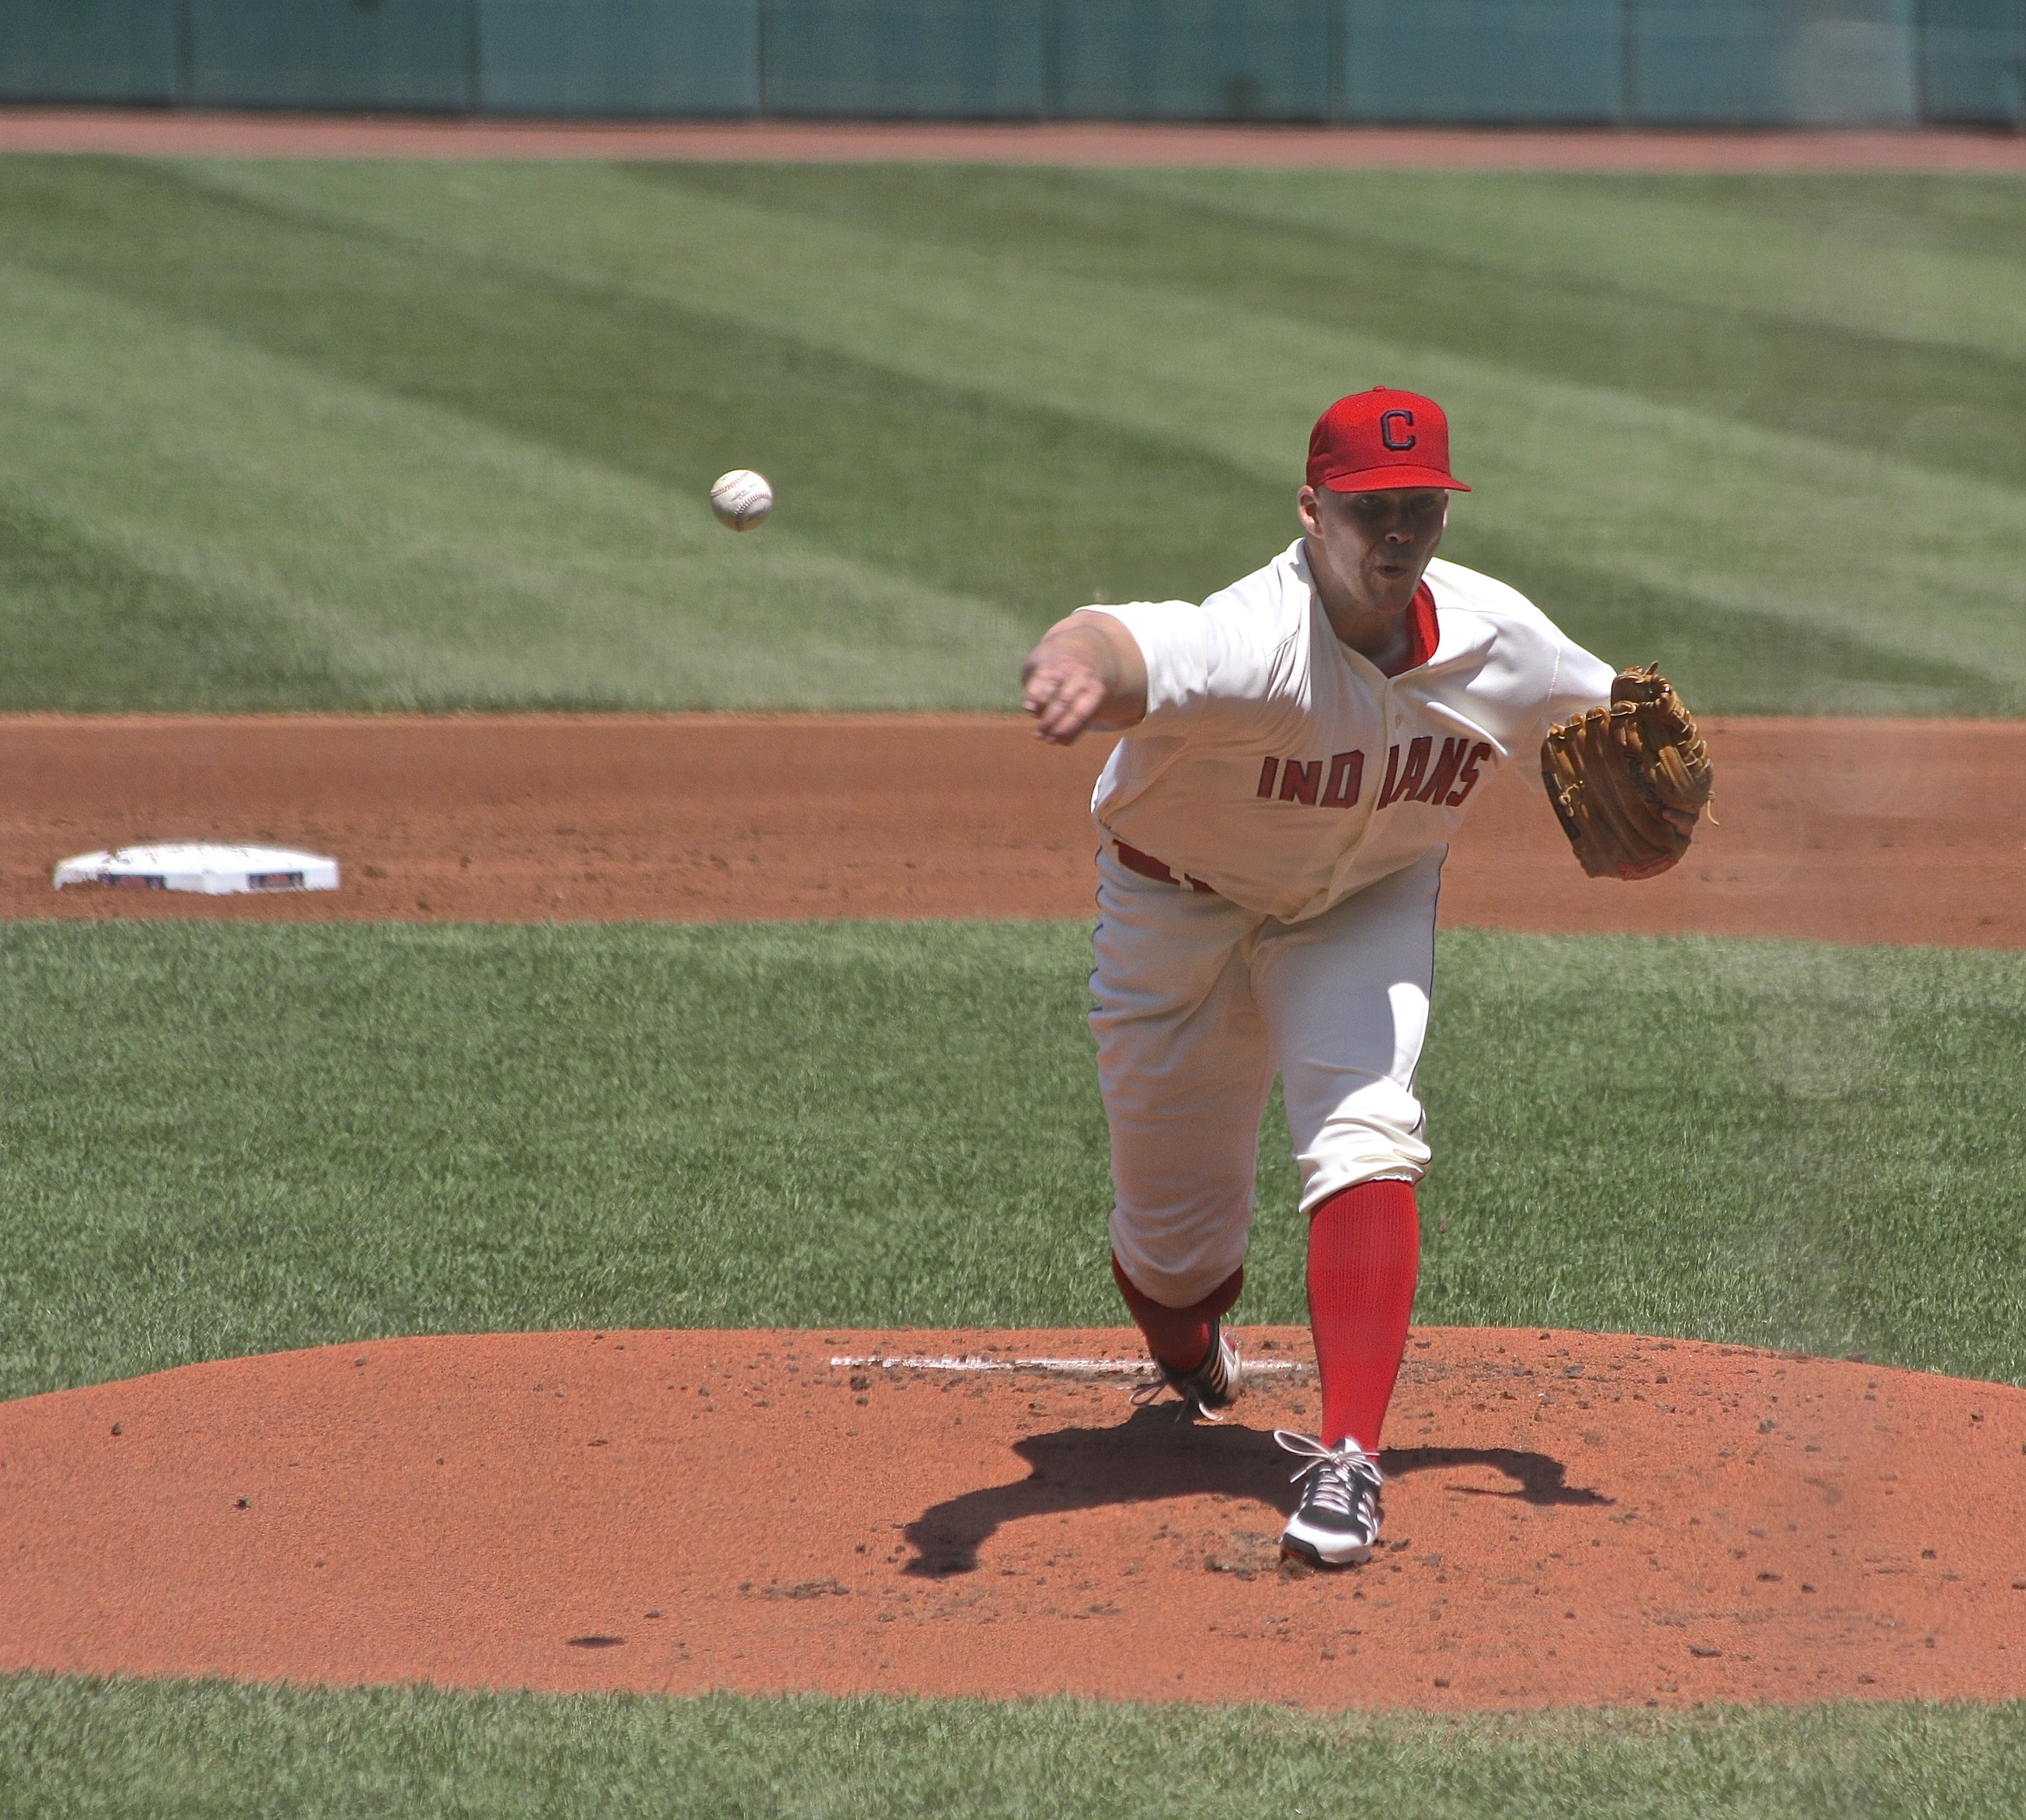 Justin Masterson on the mound